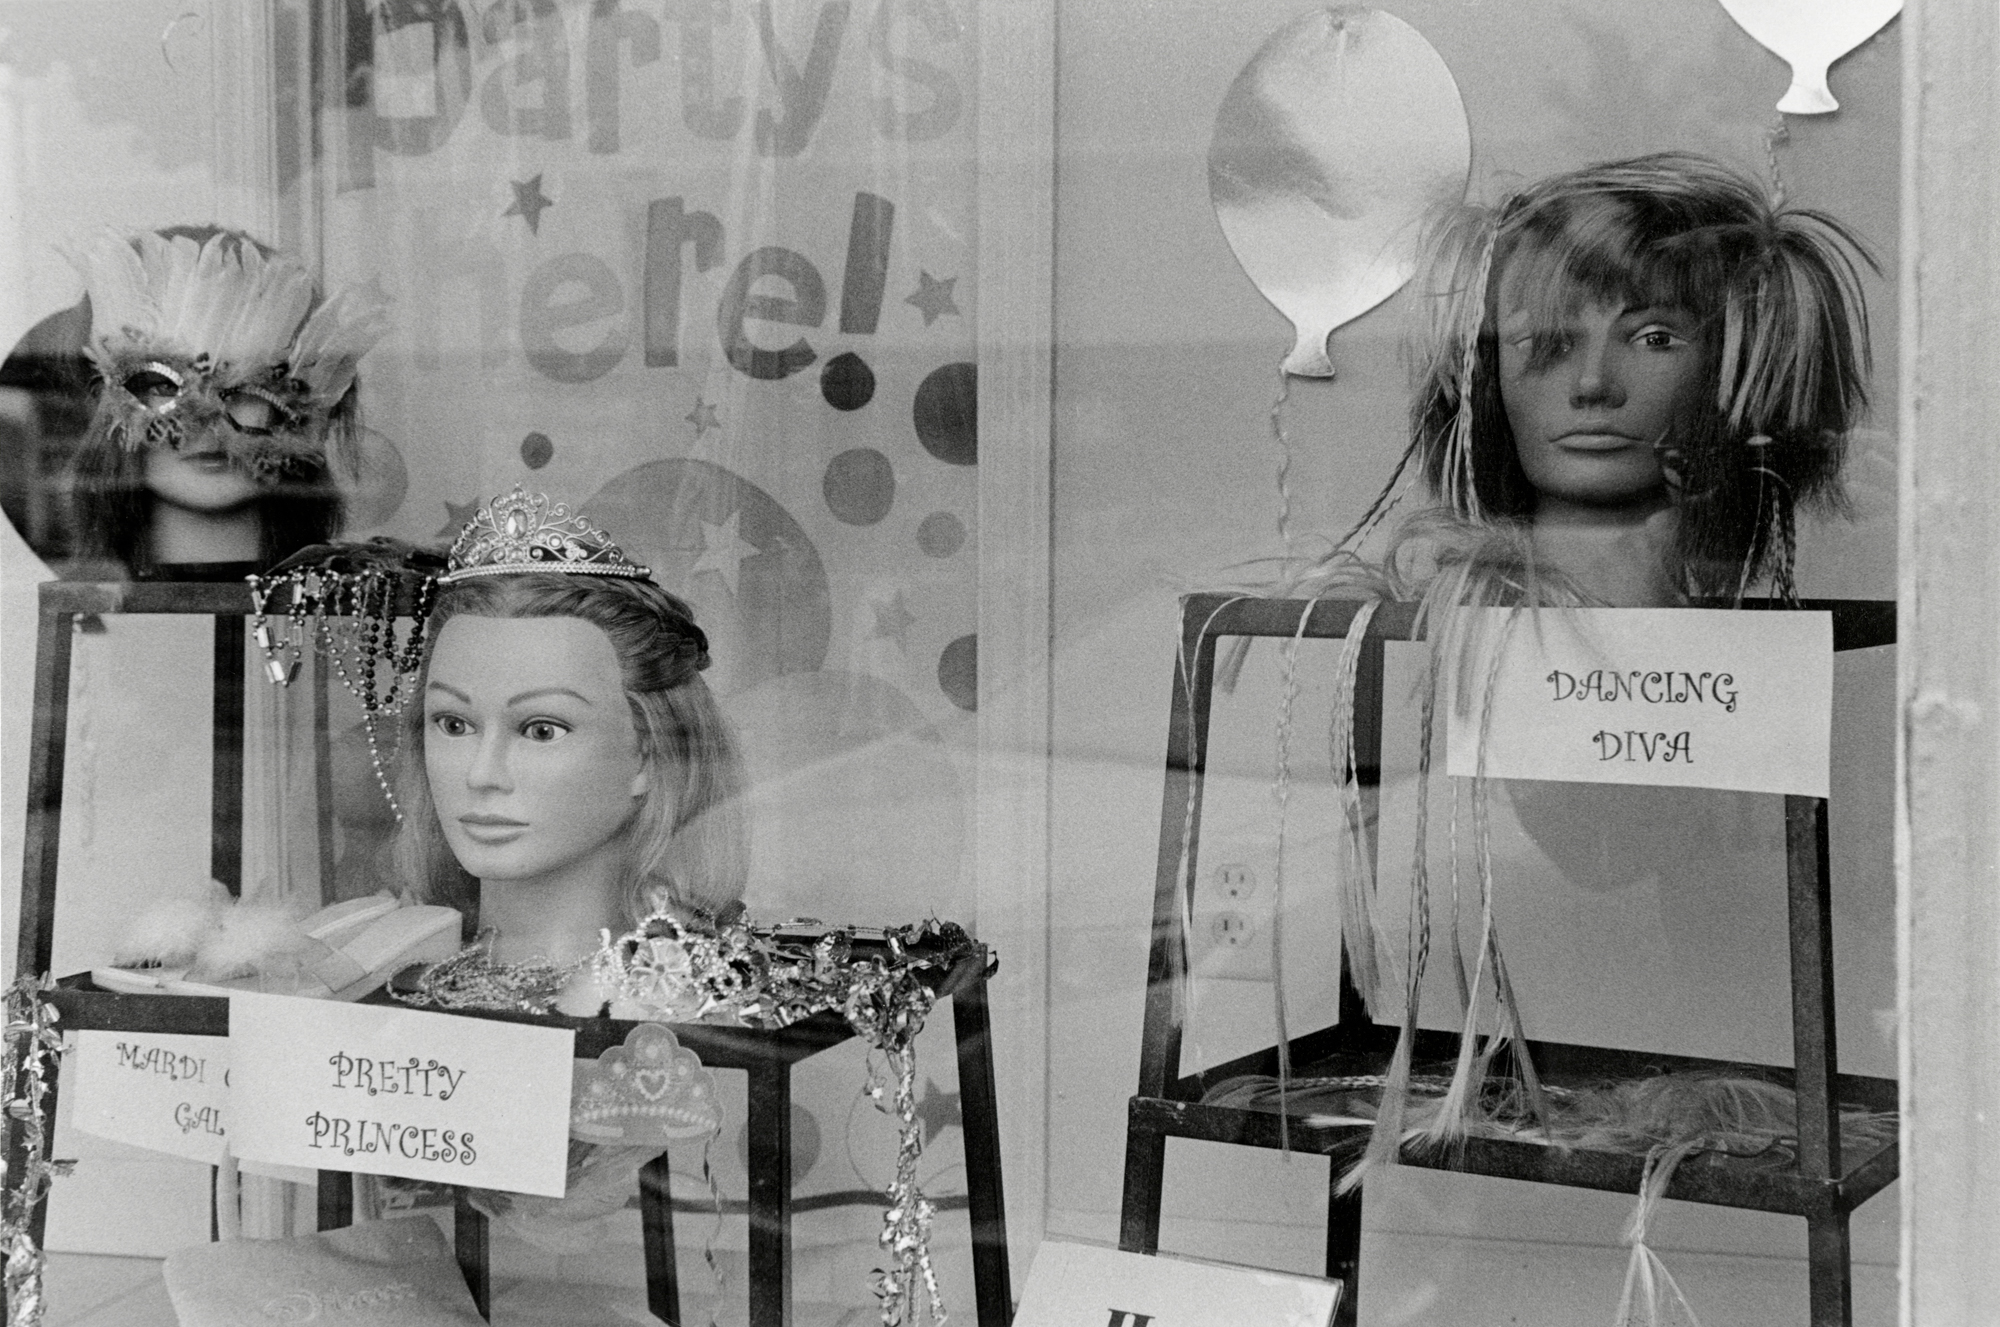 Penelope_Stone-Window_Shopping-13.jpg